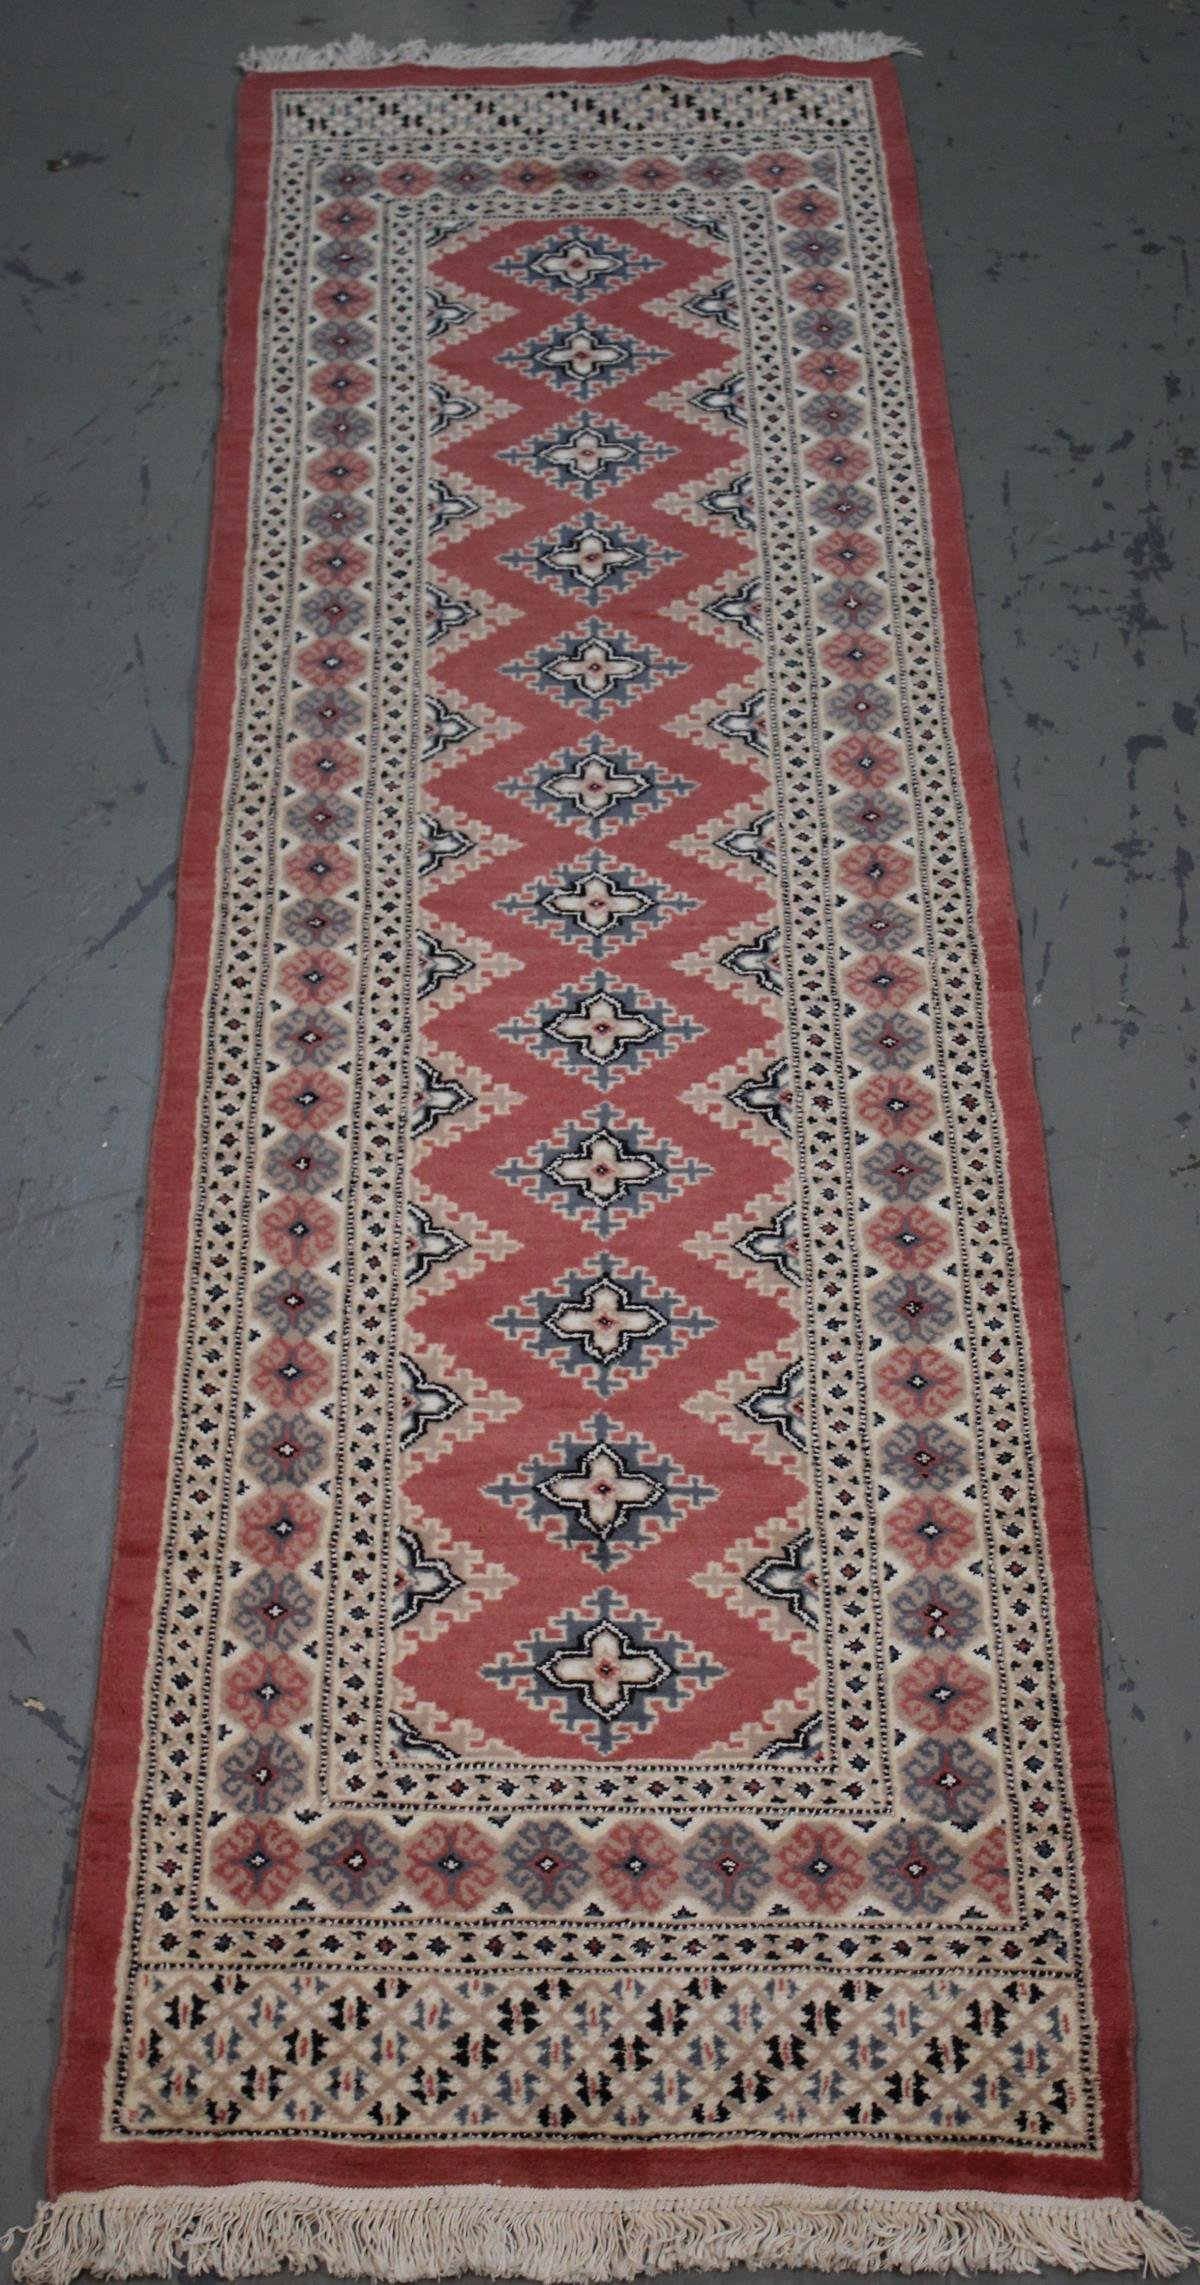 Handmade Wool/Silk Bokhara Runner 2.8x9.9